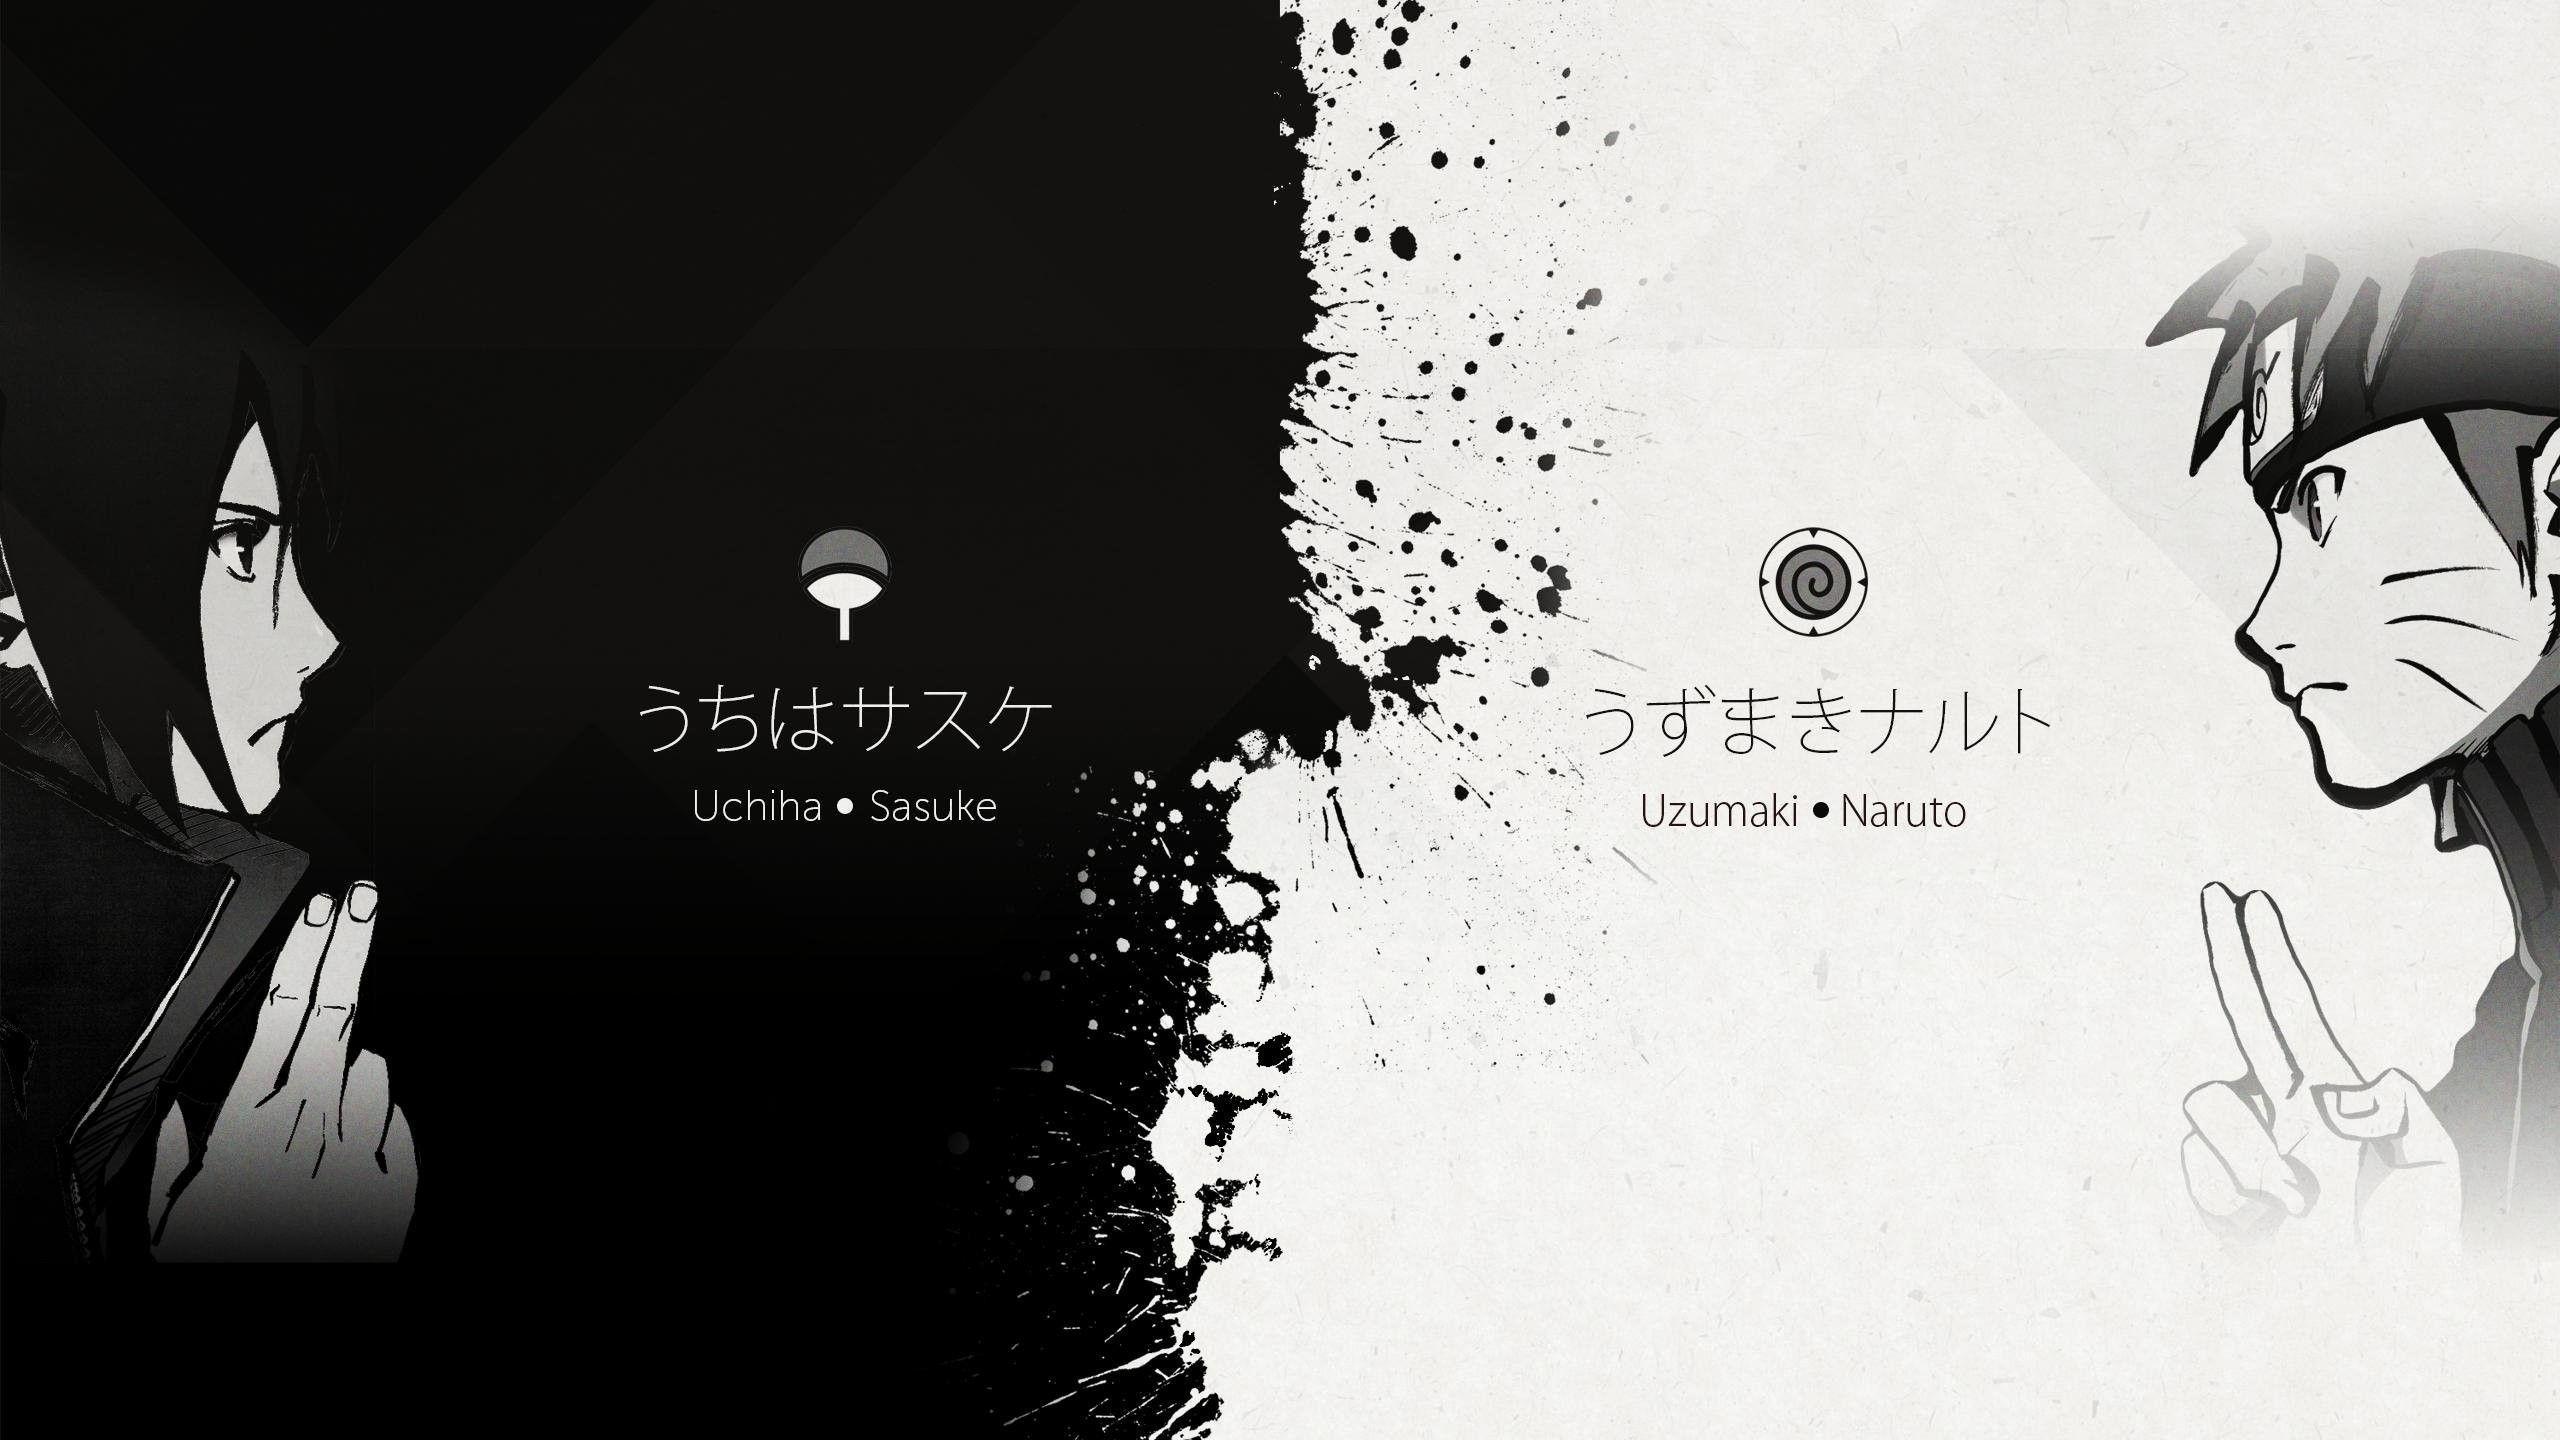 Download 500 Koleksi Wallpaper Naruto Black HD Terbaru